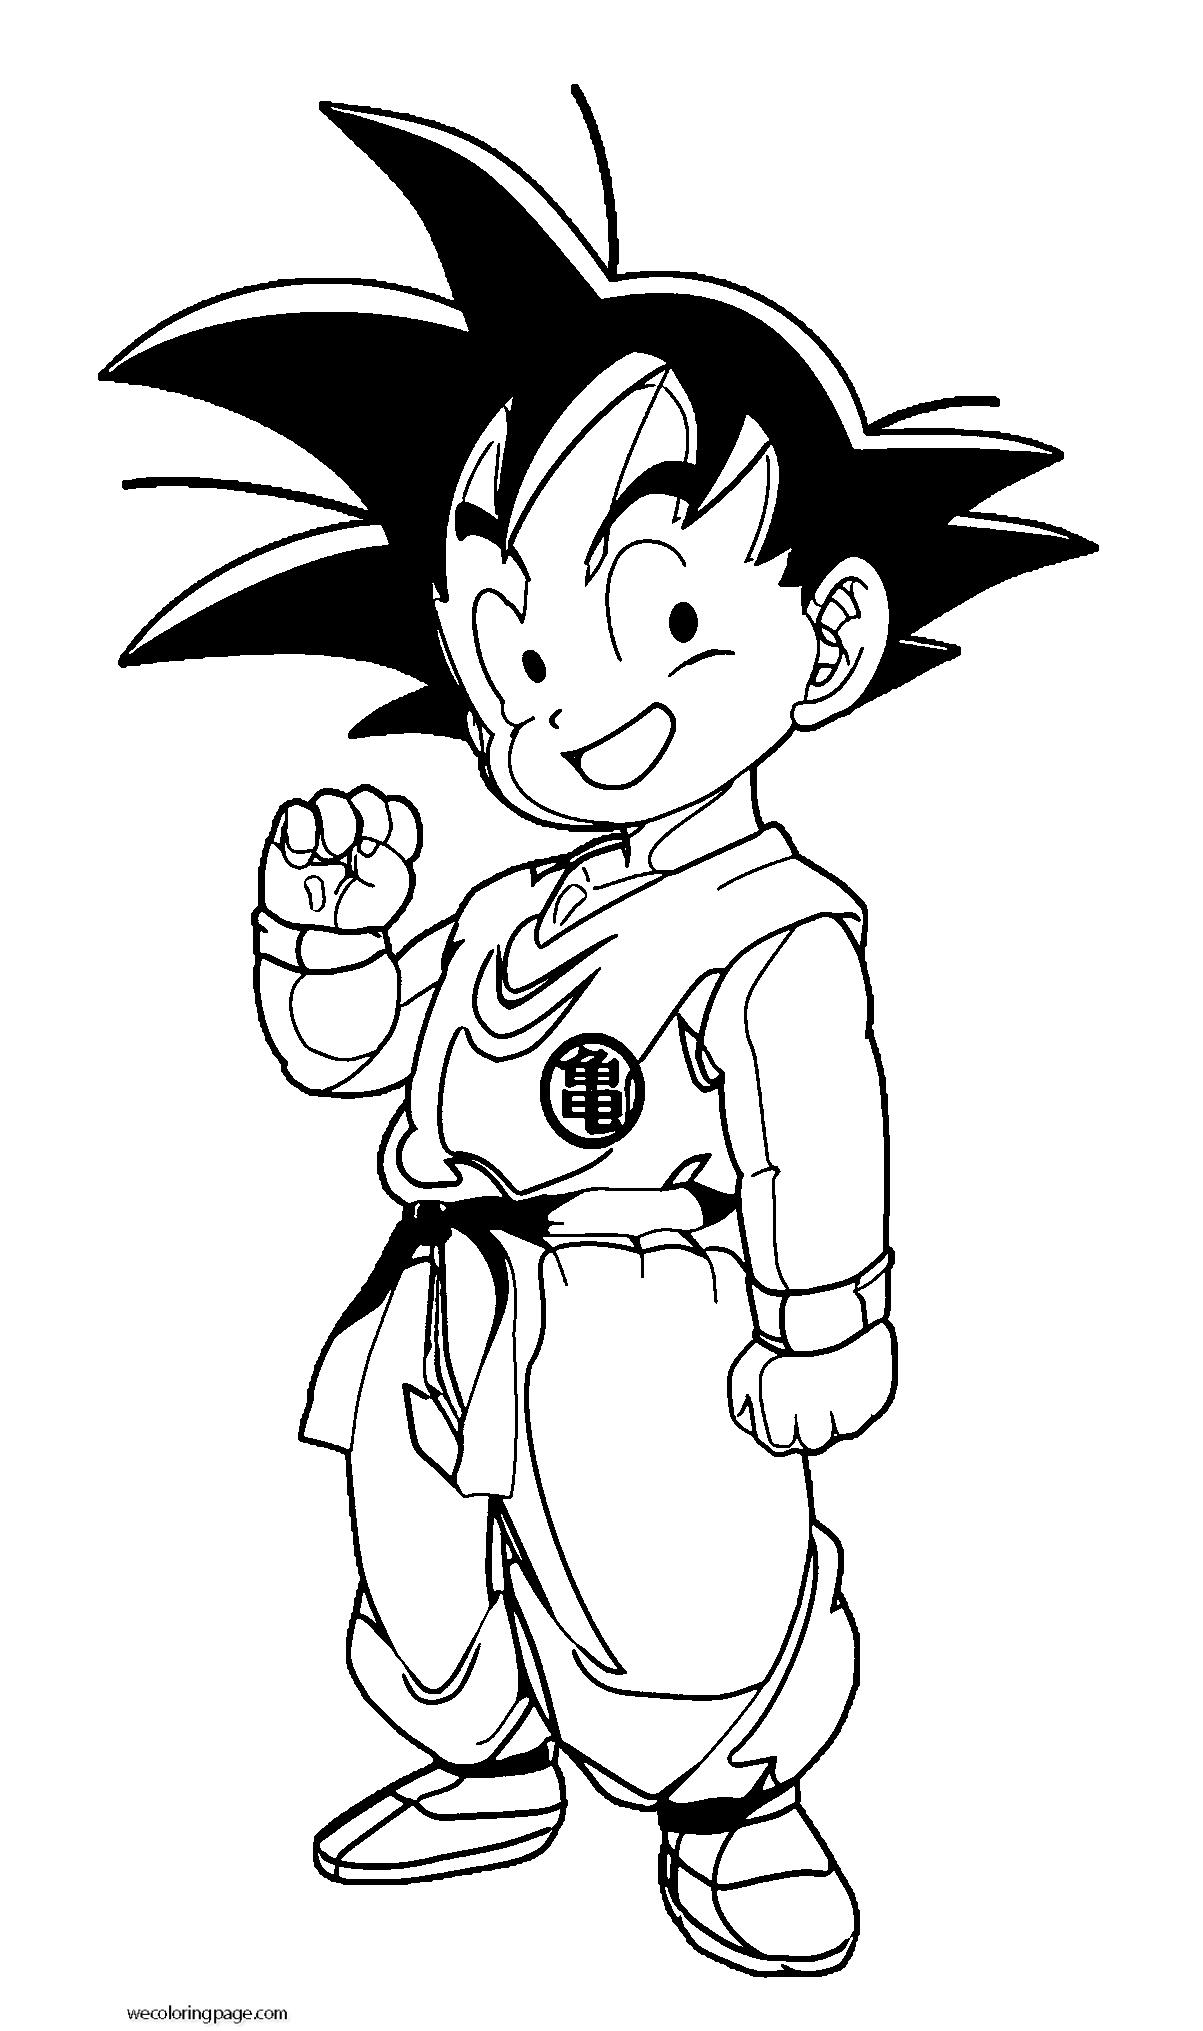 Goku We Coloring Page 010